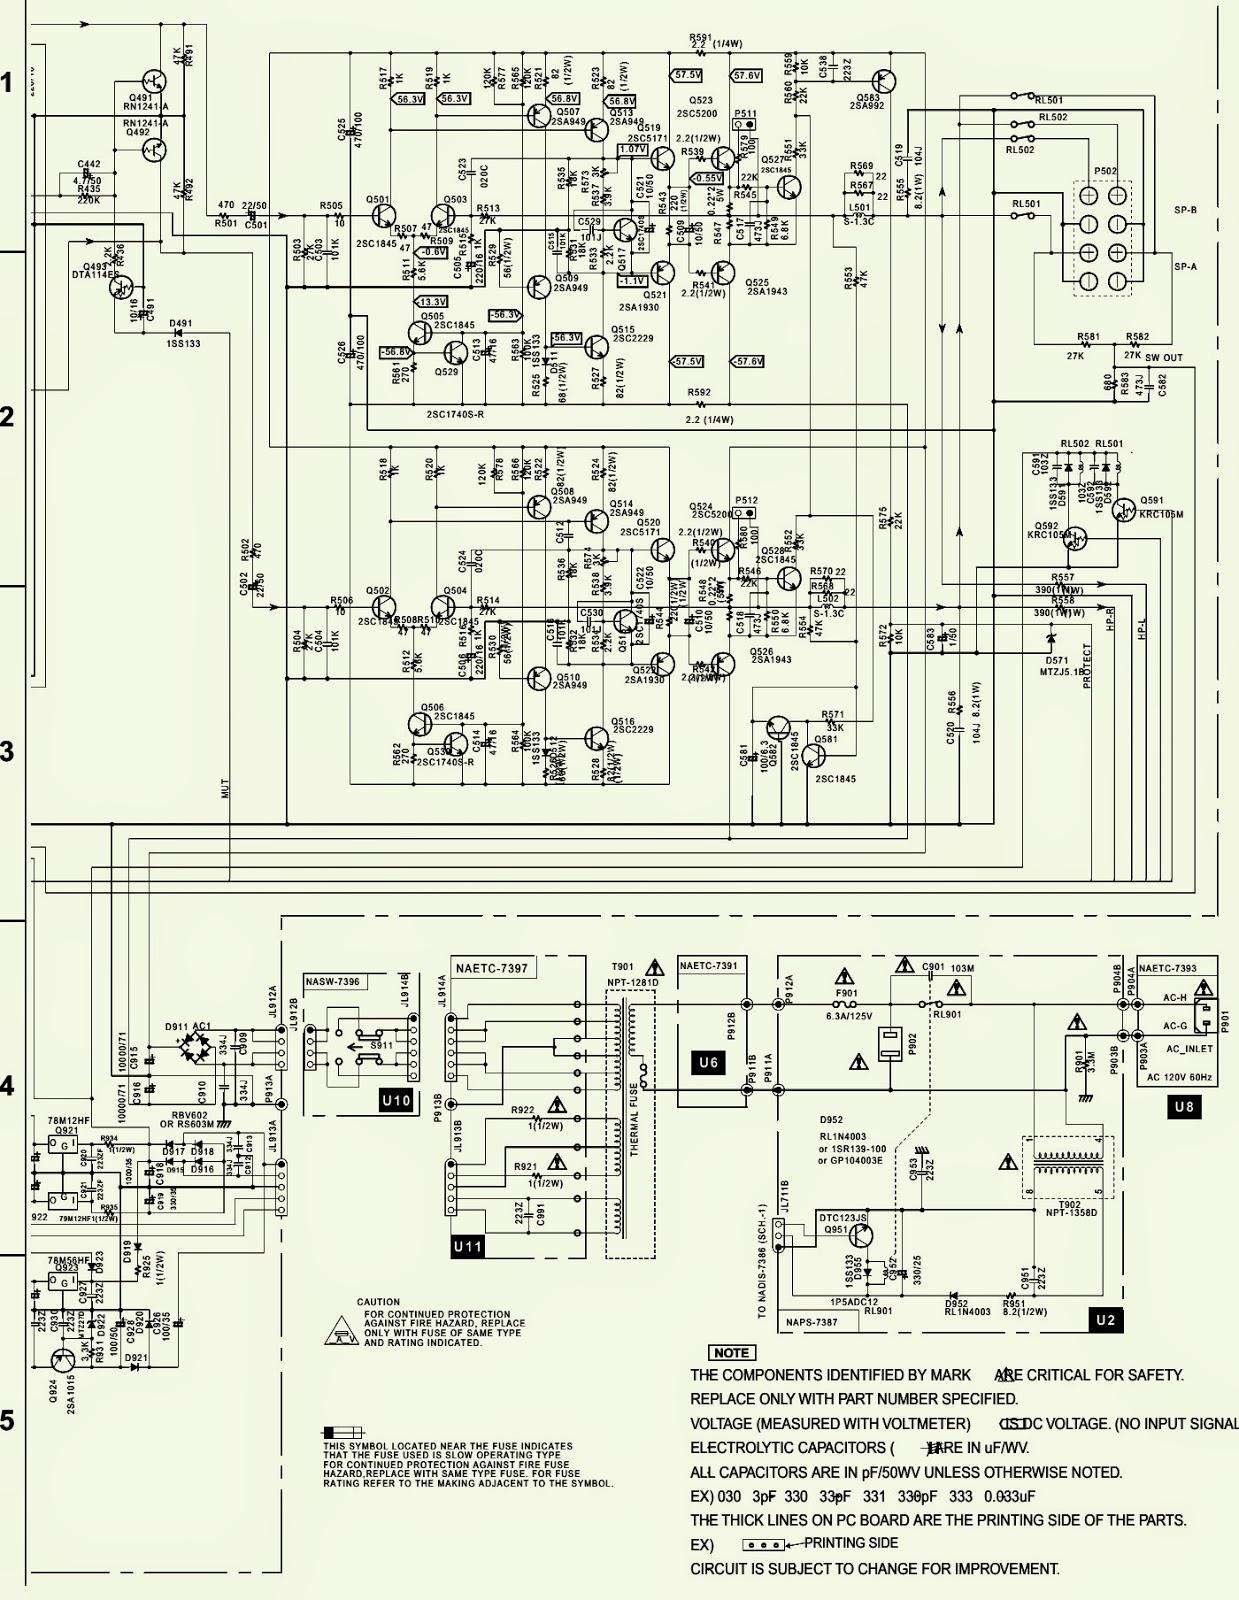 integra dtm5 3 schematic circuit diagram 2sc5200 npn 2sa1943 pnp outout transistors electro help [ 1239 x 1600 Pixel ]